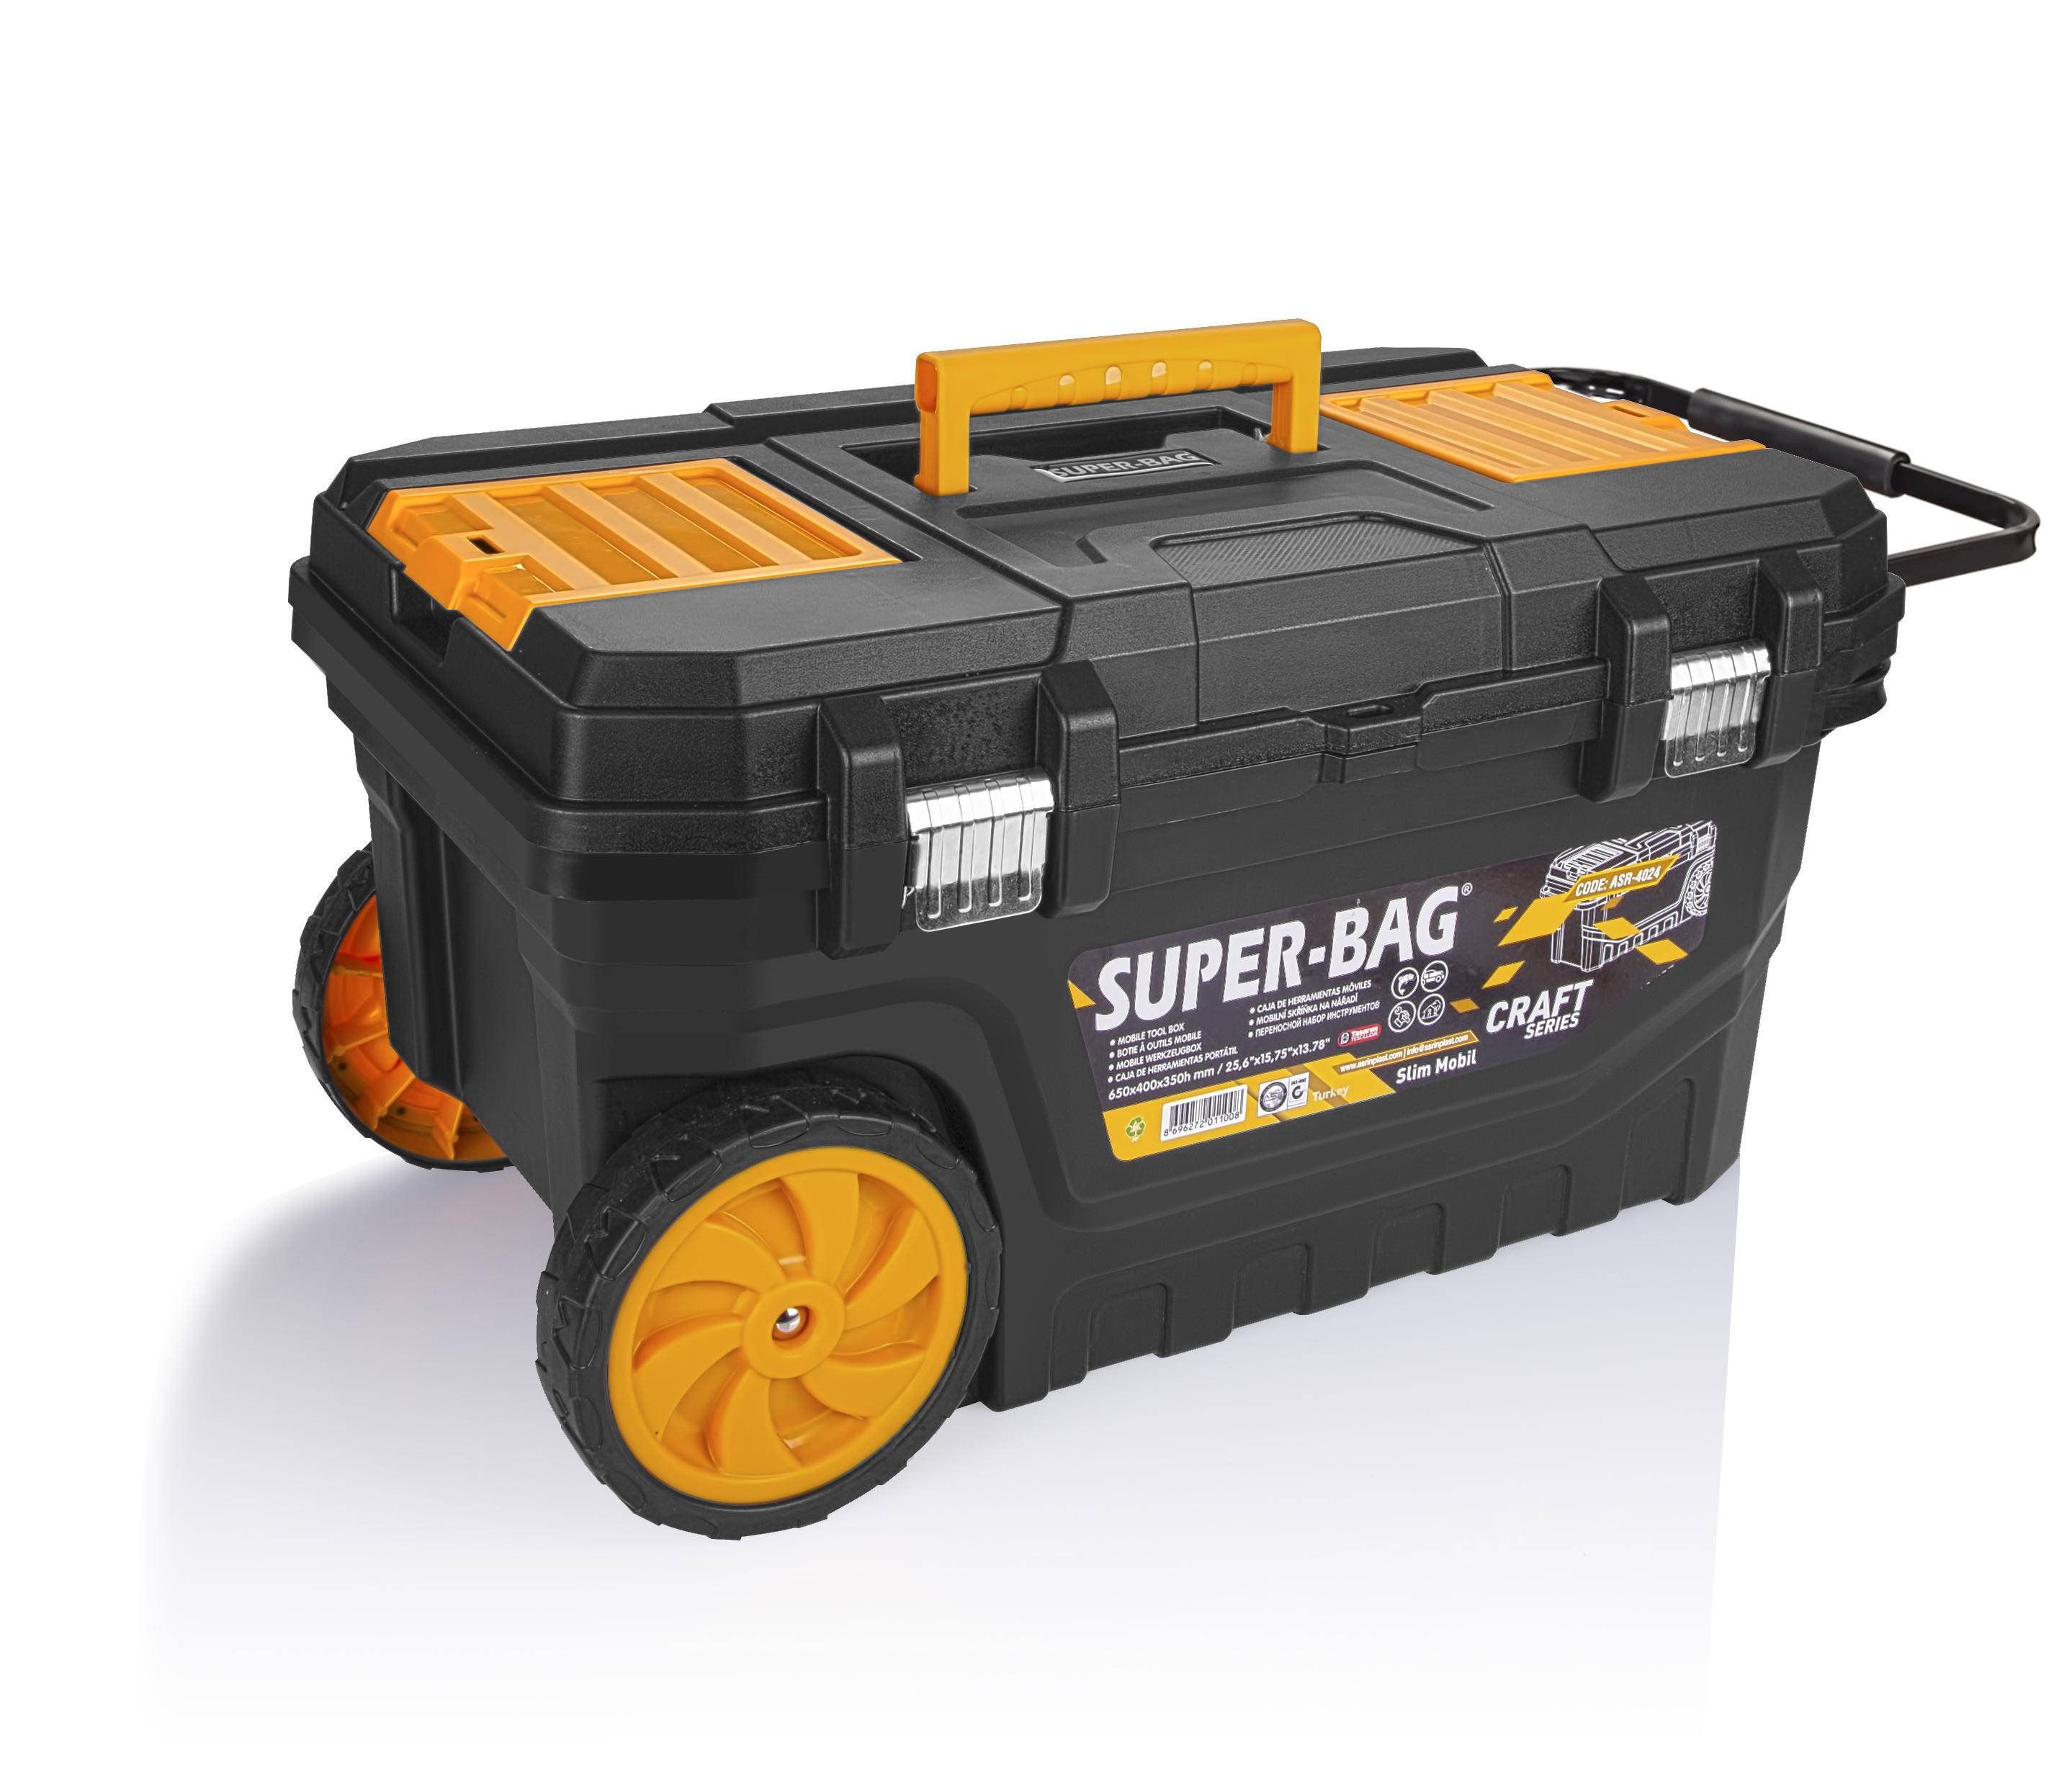 Yeni Tekerlekli Çanta; Slim Mobil